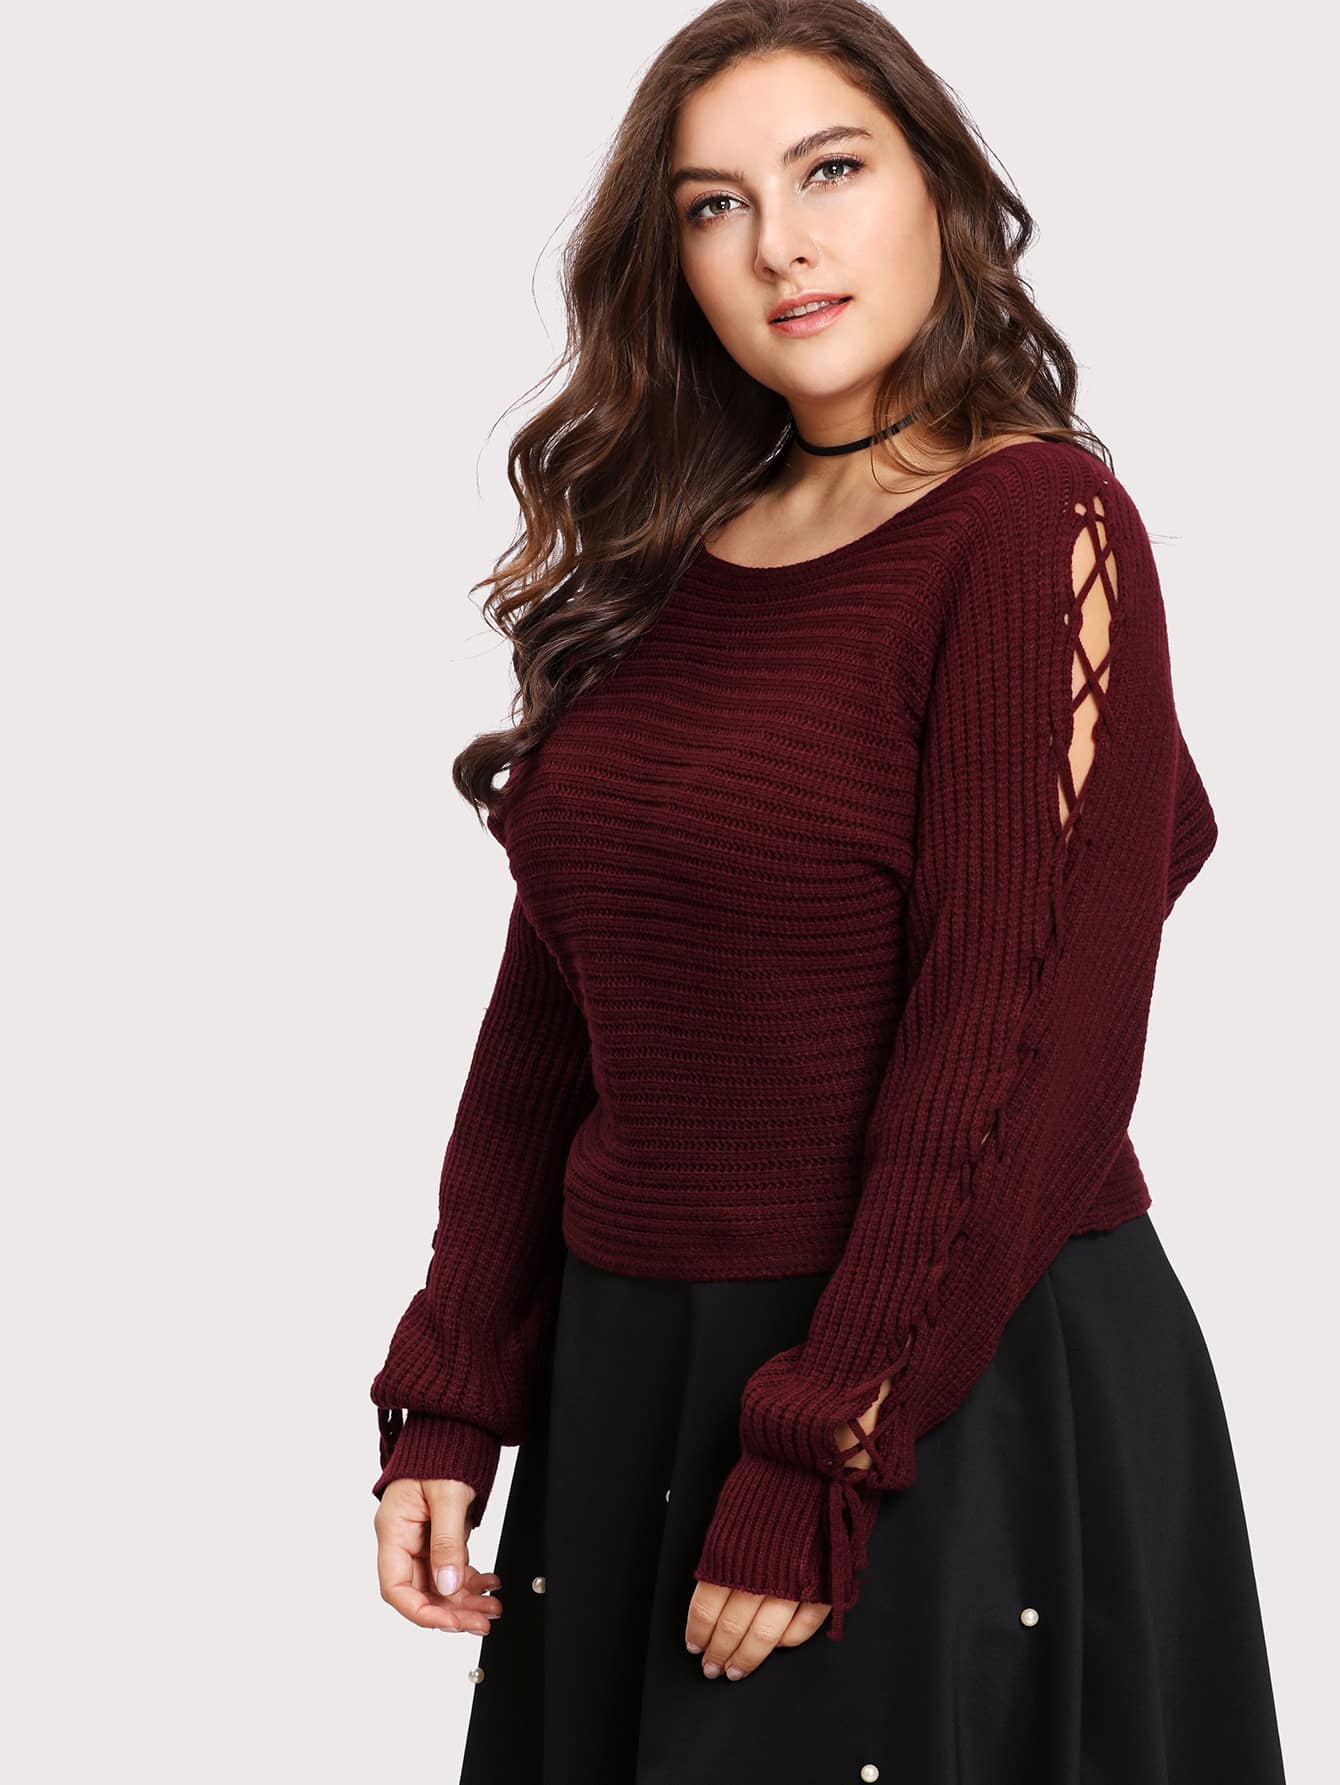 Lace Up Sleeve Waffle Knit Sweater